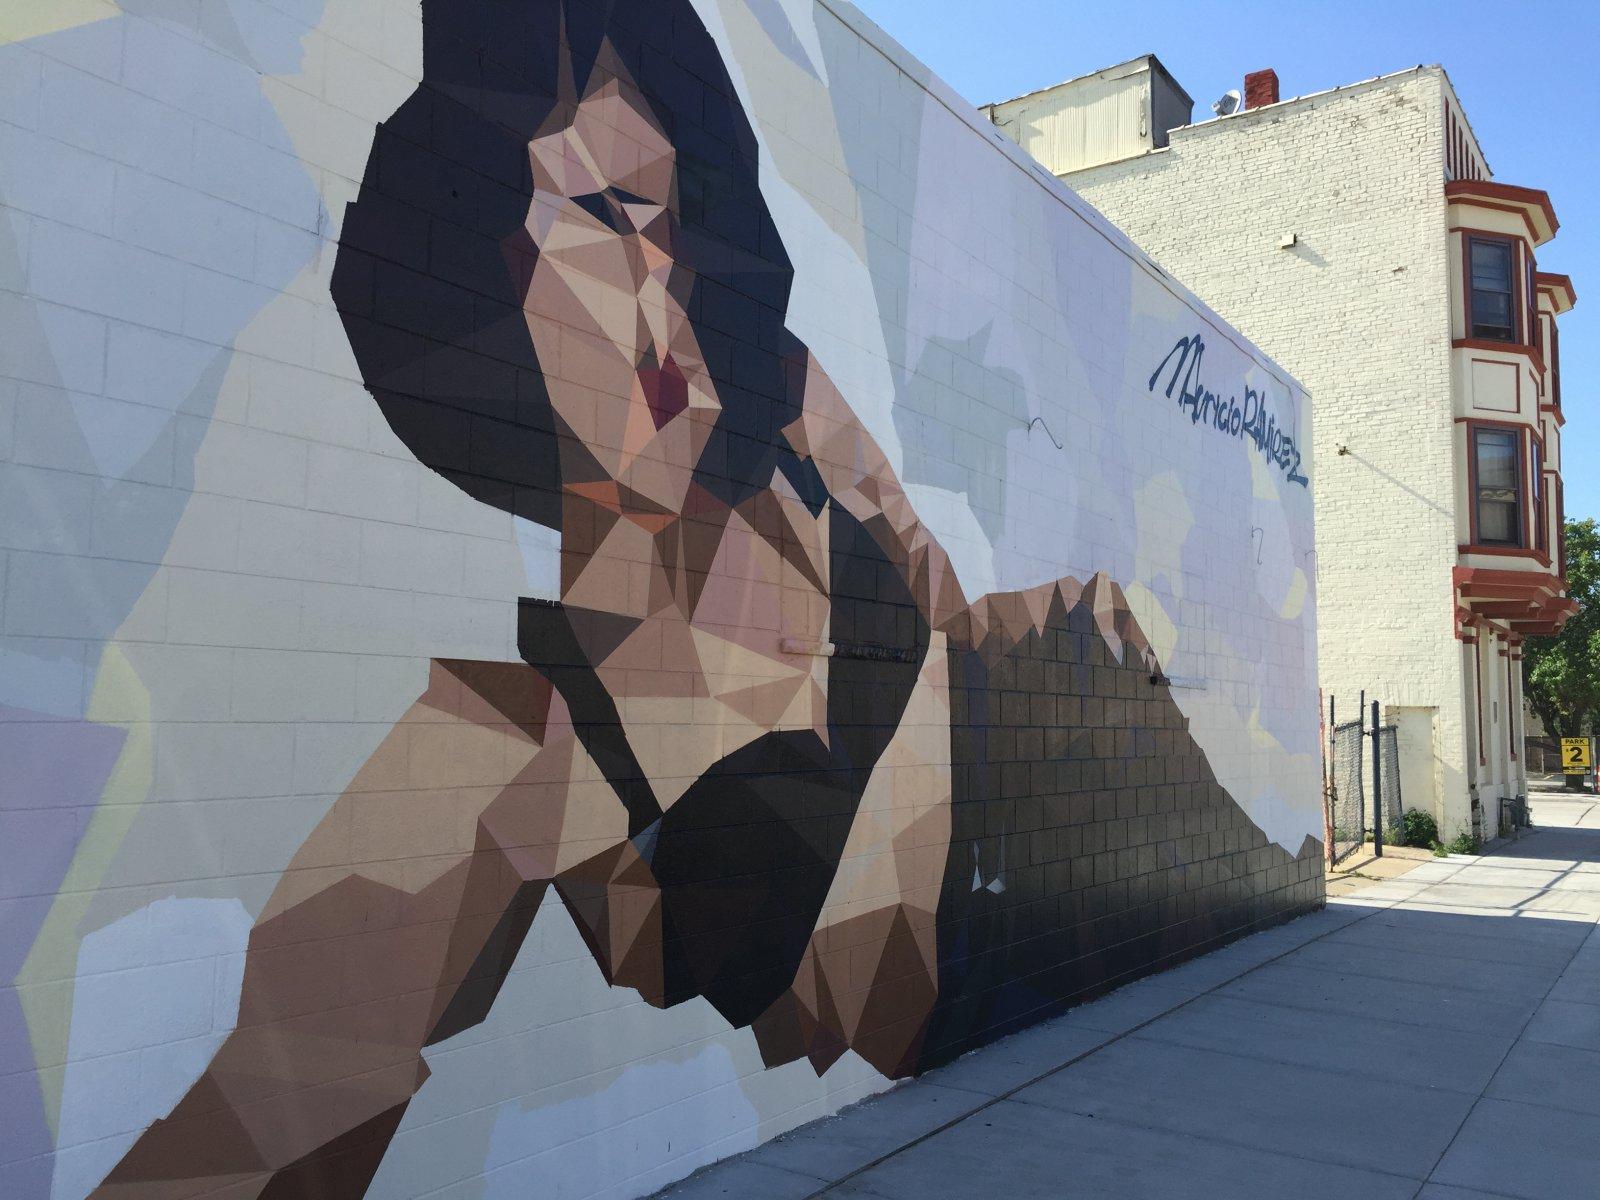 Mural of Selena Quintanilla-Pérez by Mauricio Ramirez in Walker's Point. Photo by Dave Reid.